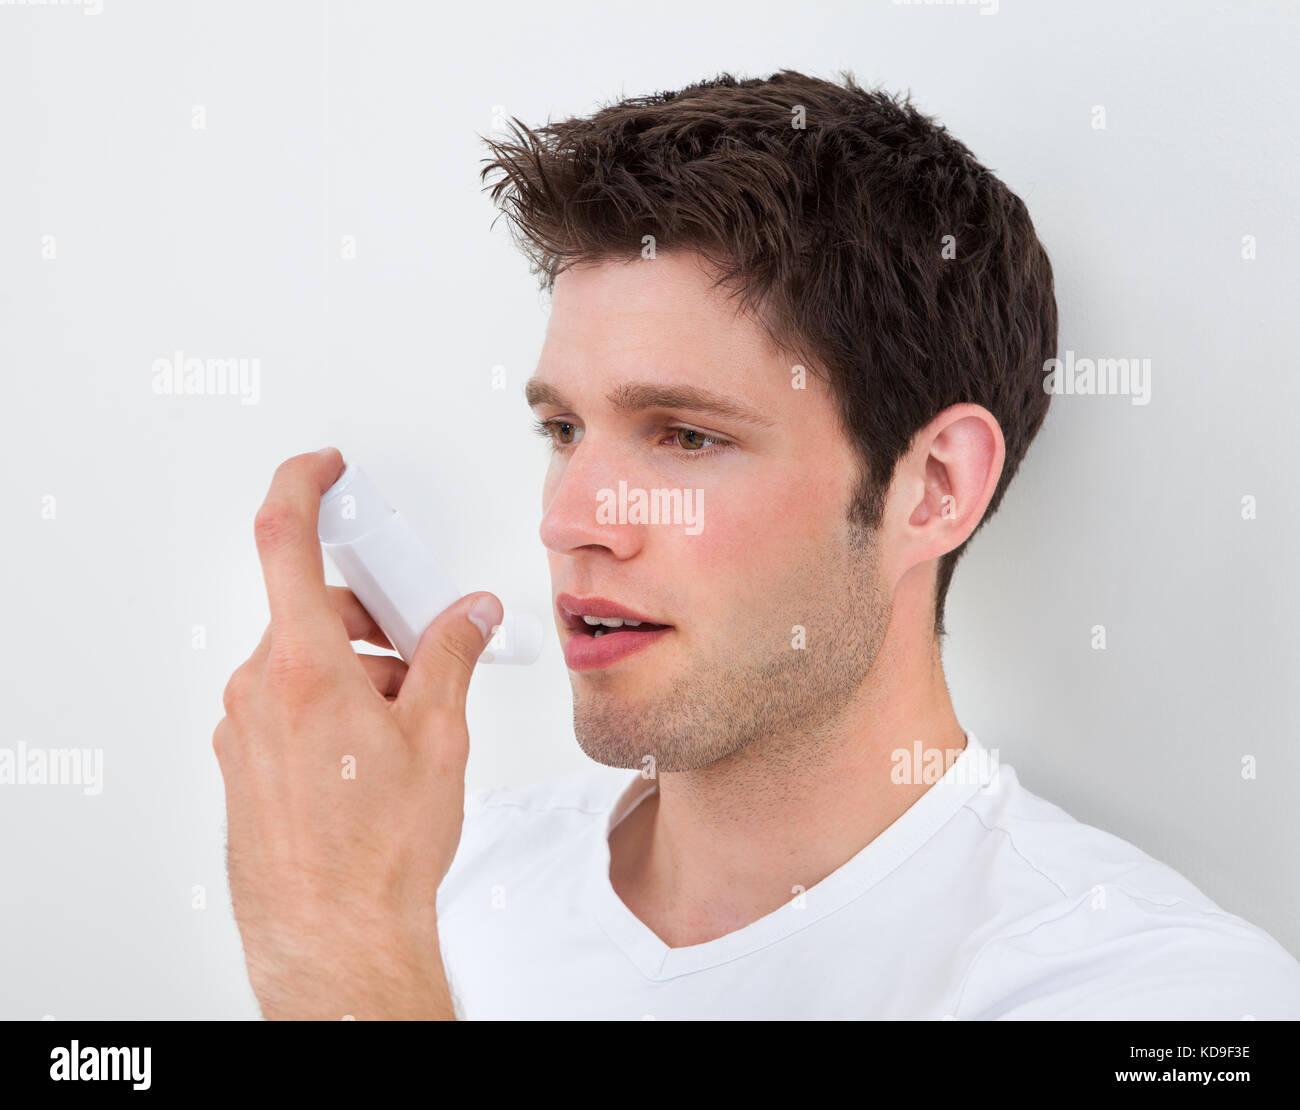 Young Man Holding An Asthma Medicine Inhaler - Stock Image